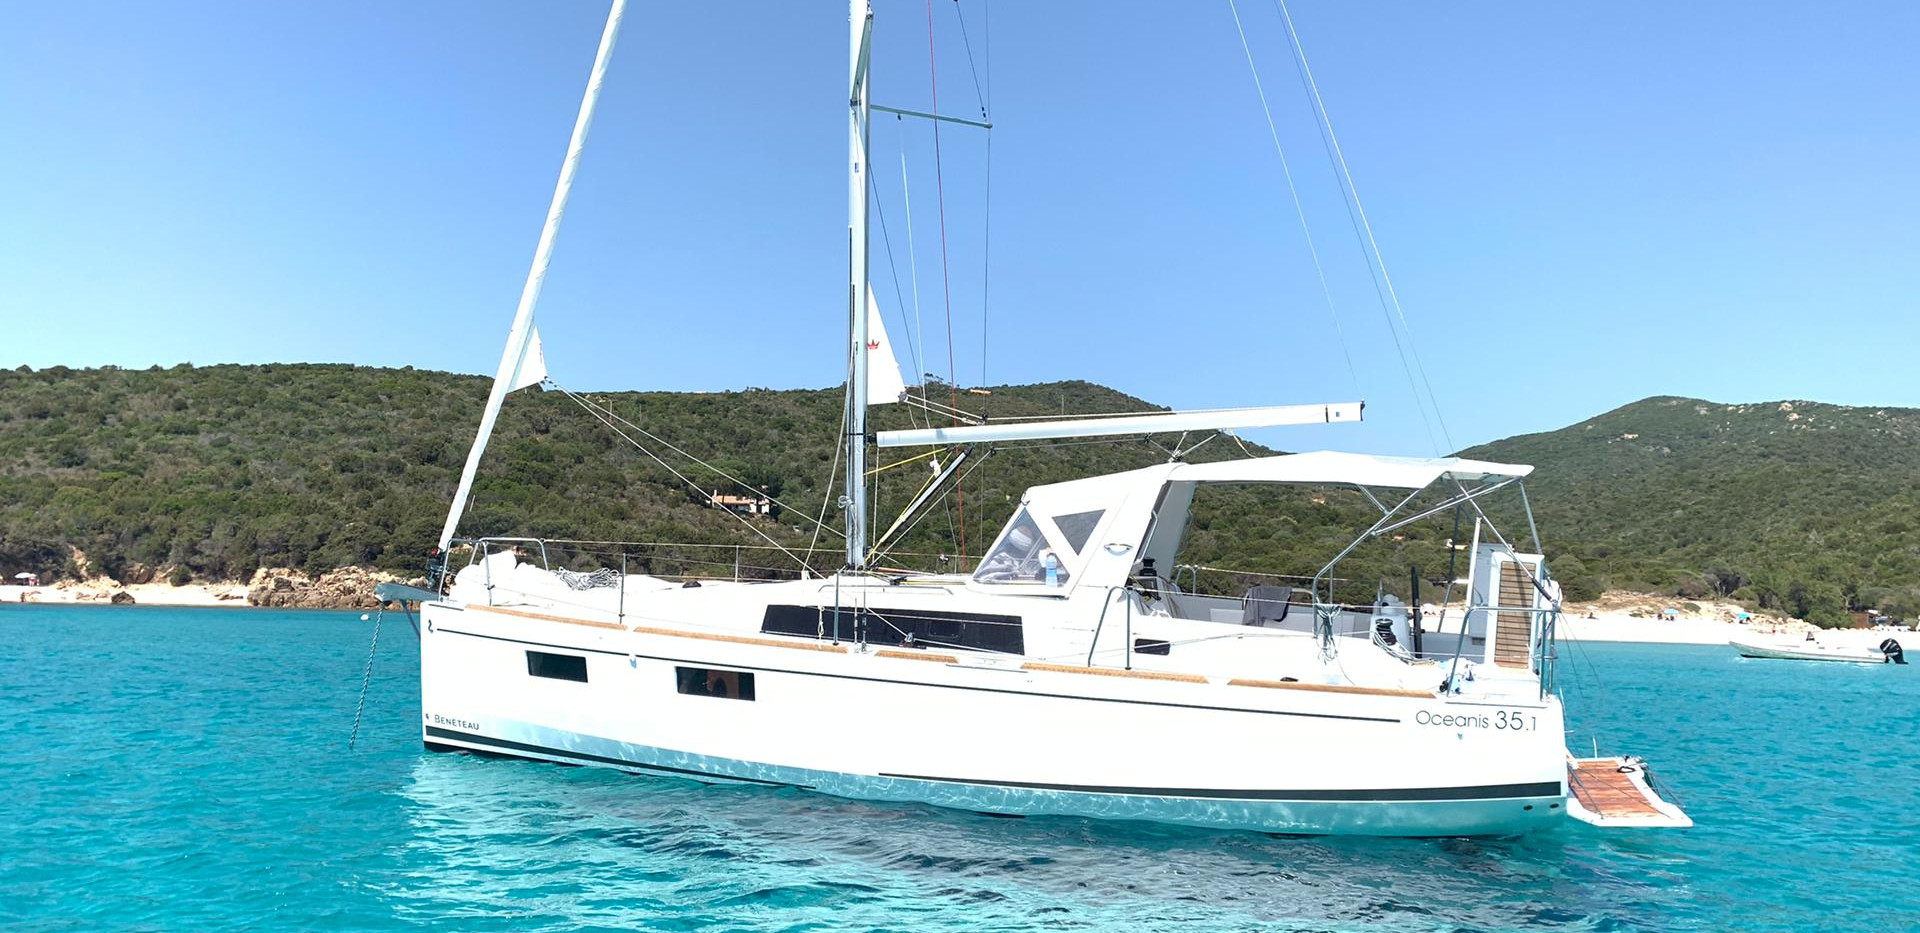 Sailing in corsica